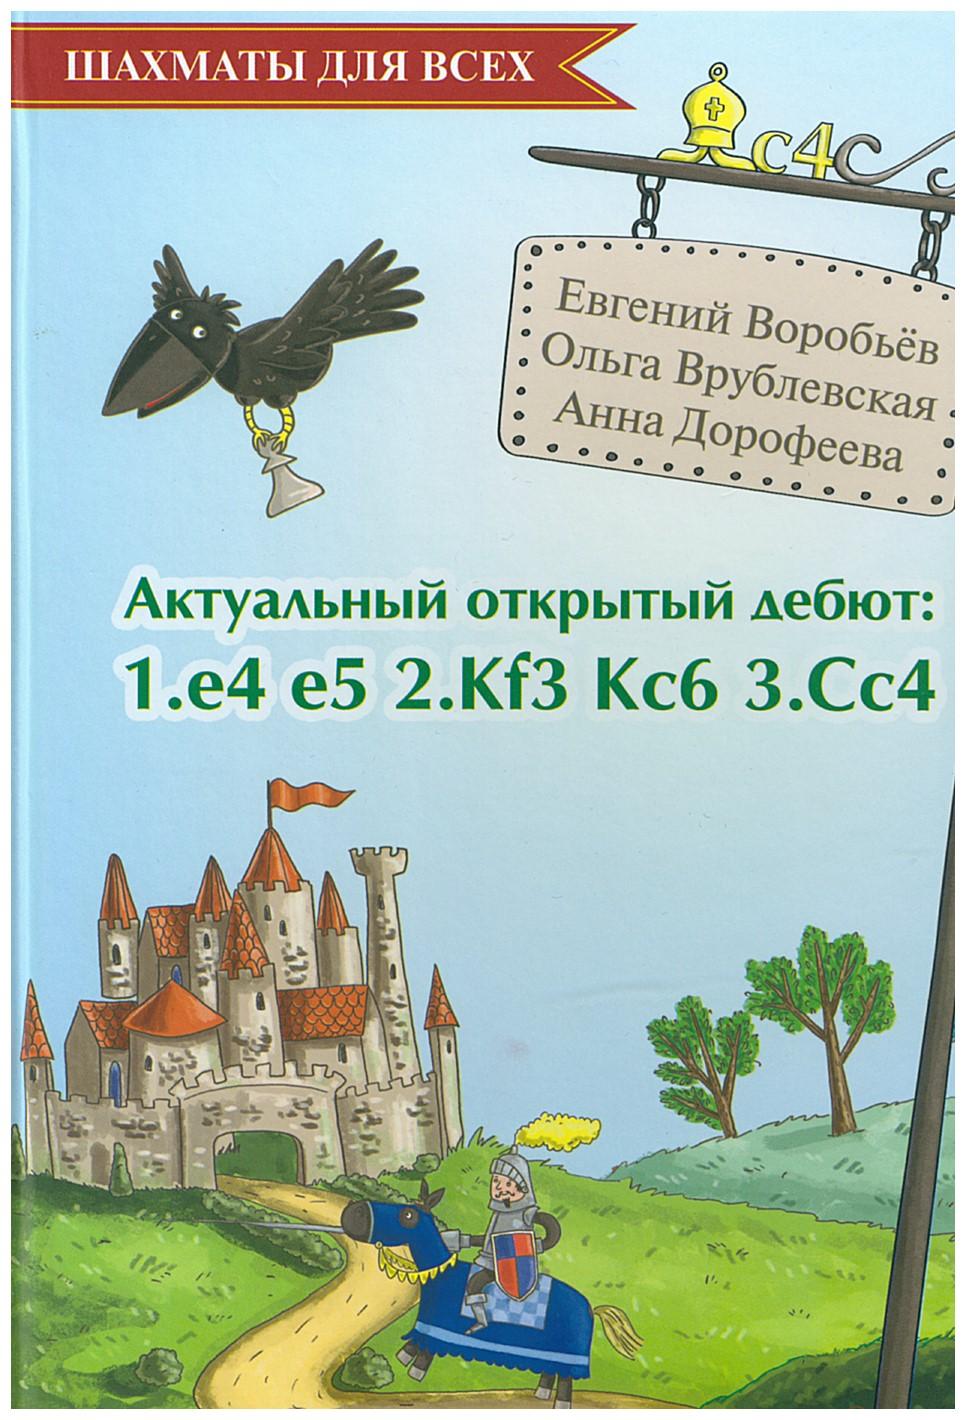 Вышла новая книга — Актуальный шахматный дебют